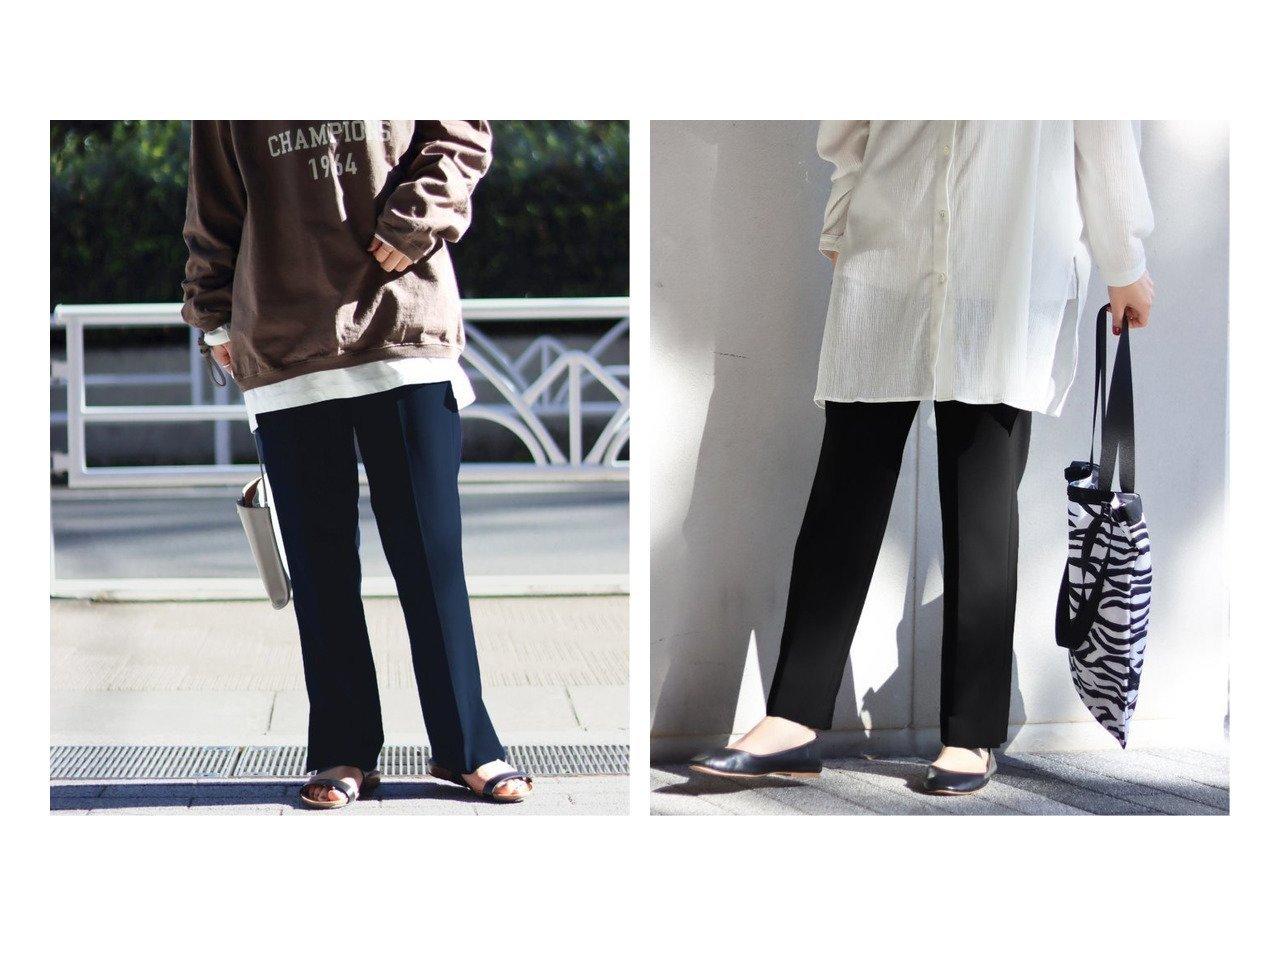 【JOURNAL STANDARD/ジャーナルスタンダード】のWクロス サイドベントパンツ パンツのおすすめ!人気、トレンド・レディースファッションの通販 おすすめで人気の流行・トレンド、ファッションの通販商品 メンズファッション・キッズファッション・インテリア・家具・レディースファッション・服の通販 founy(ファニー) https://founy.com/ ファッション Fashion レディースファッション WOMEN パンツ Pants 2021年 2021 2021 春夏 S/S SS Spring/Summer 2021 S/S 春夏 SS Spring/Summer スウェット スニーカー フィット 再入荷 Restock/Back in Stock/Re Arrival |ID:crp329100000024695